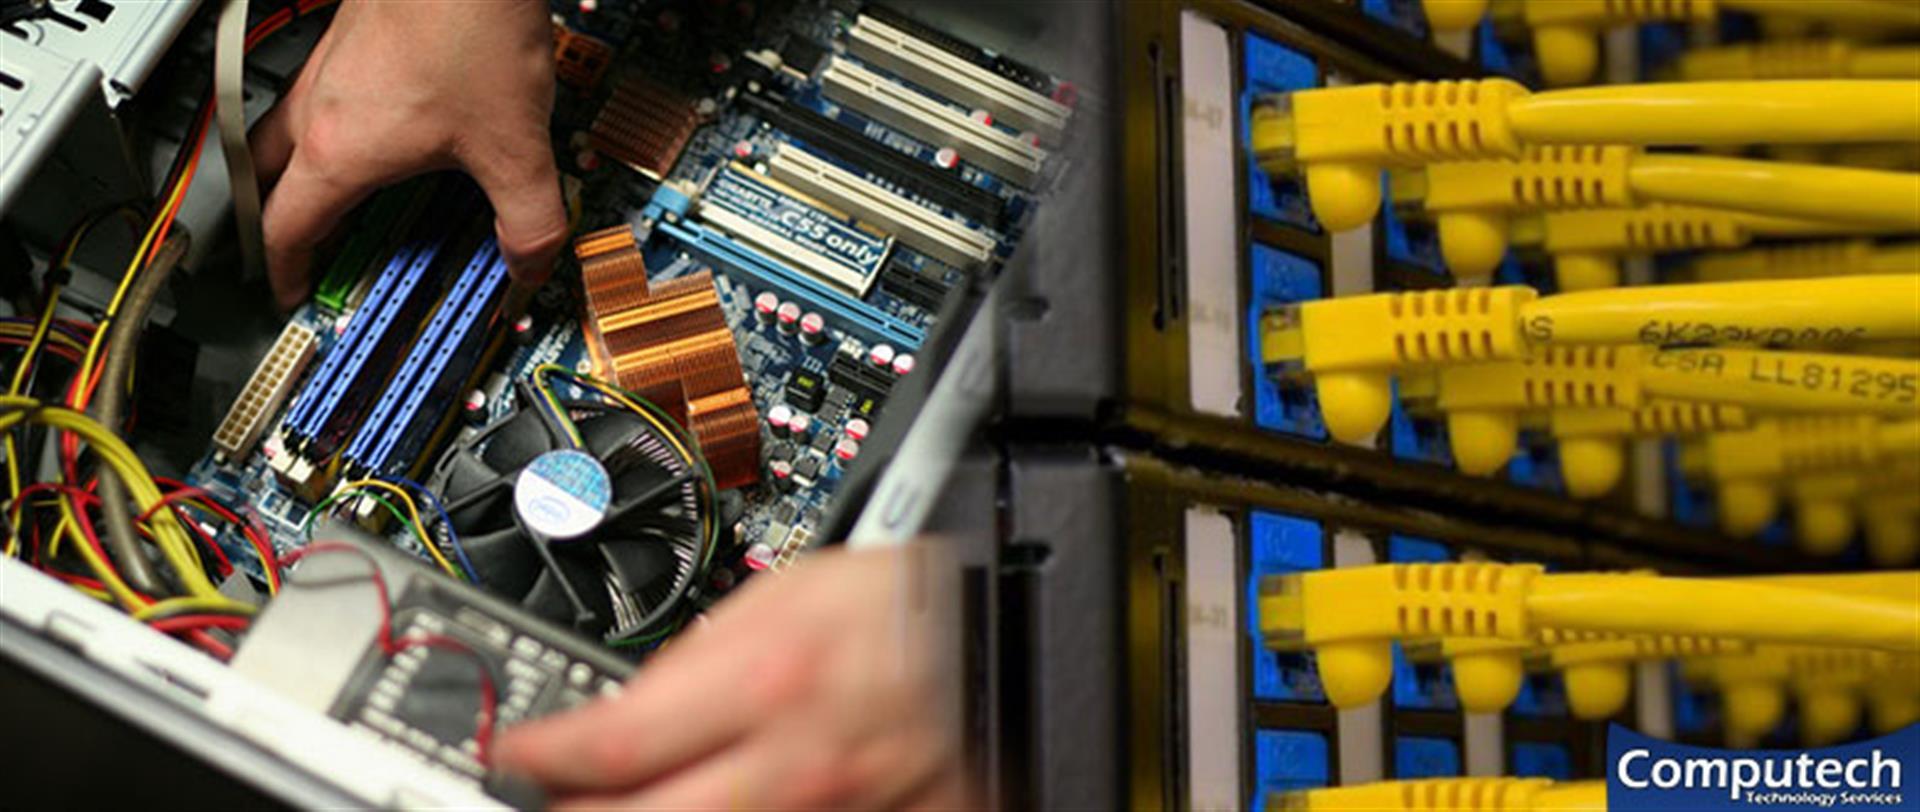 Fredericksburg Virginia Onsite Computer PC & Printer Repair, Networks, Voice & Data Cabling Services